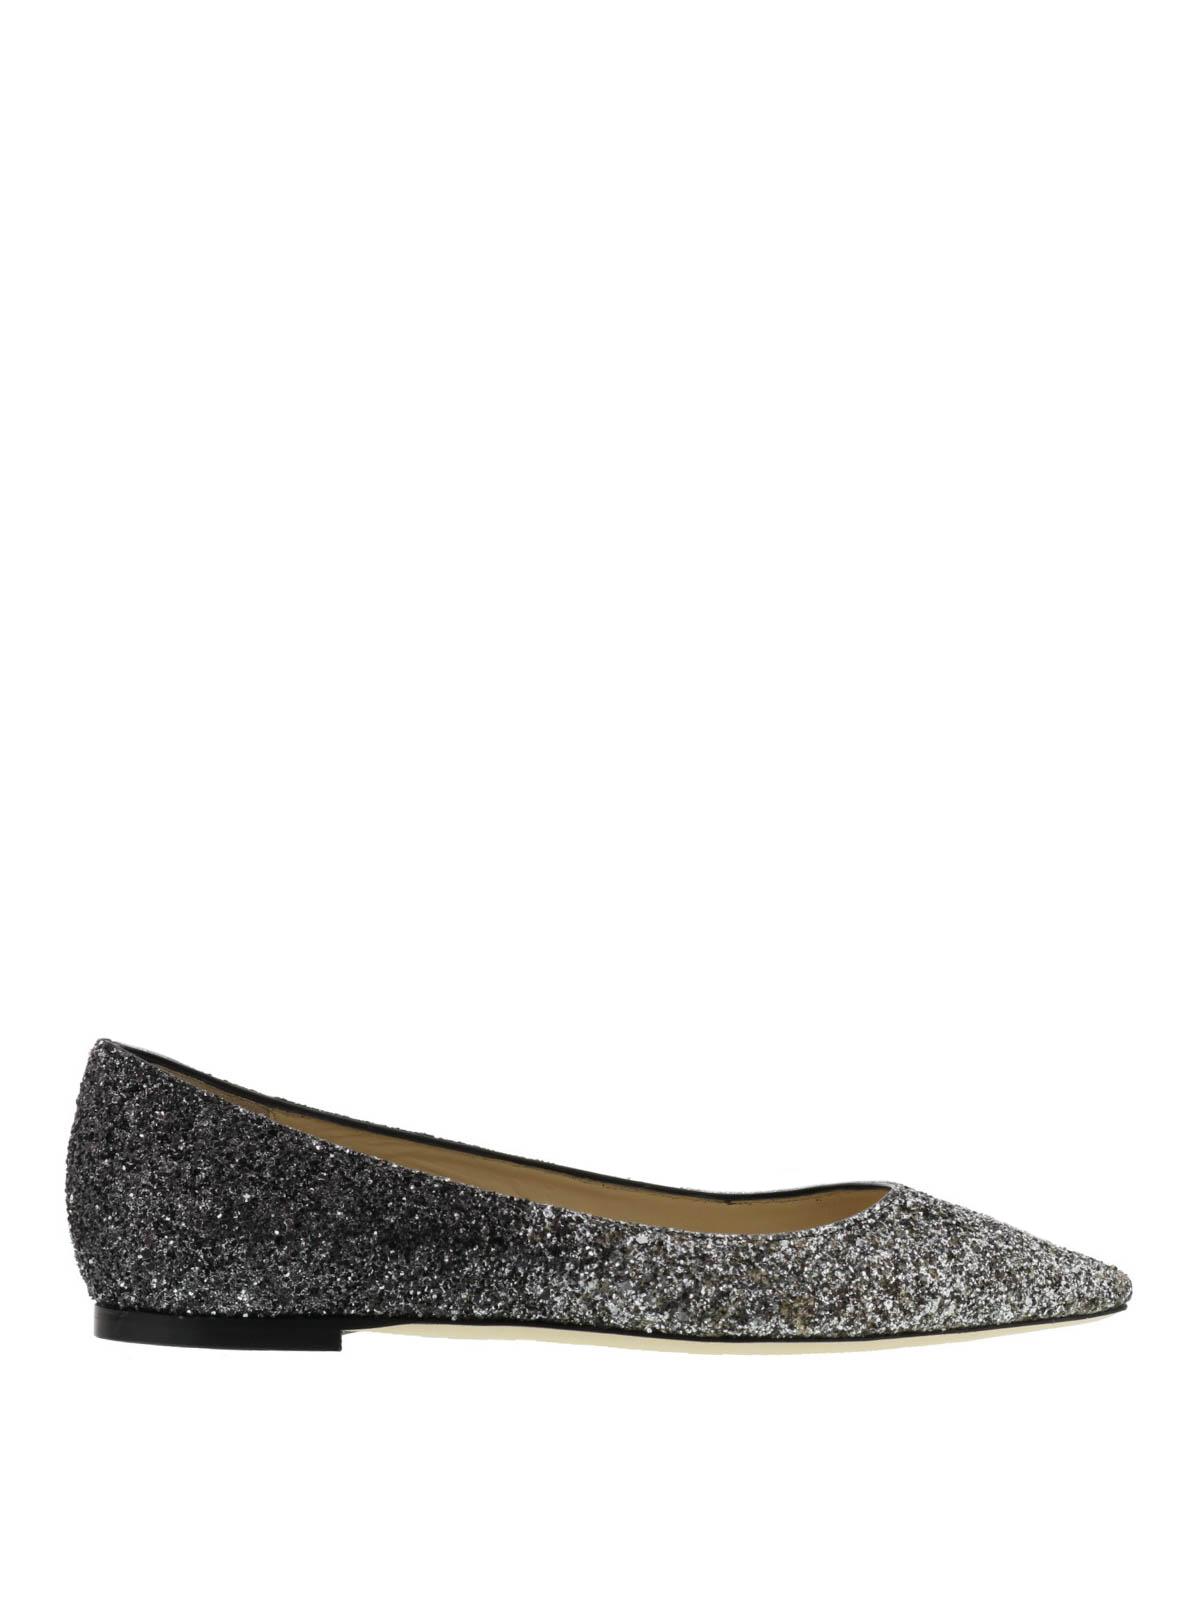 937c90623b04 Jimmy Choo - Romy faded glitter ballerinas - flat shoes ...